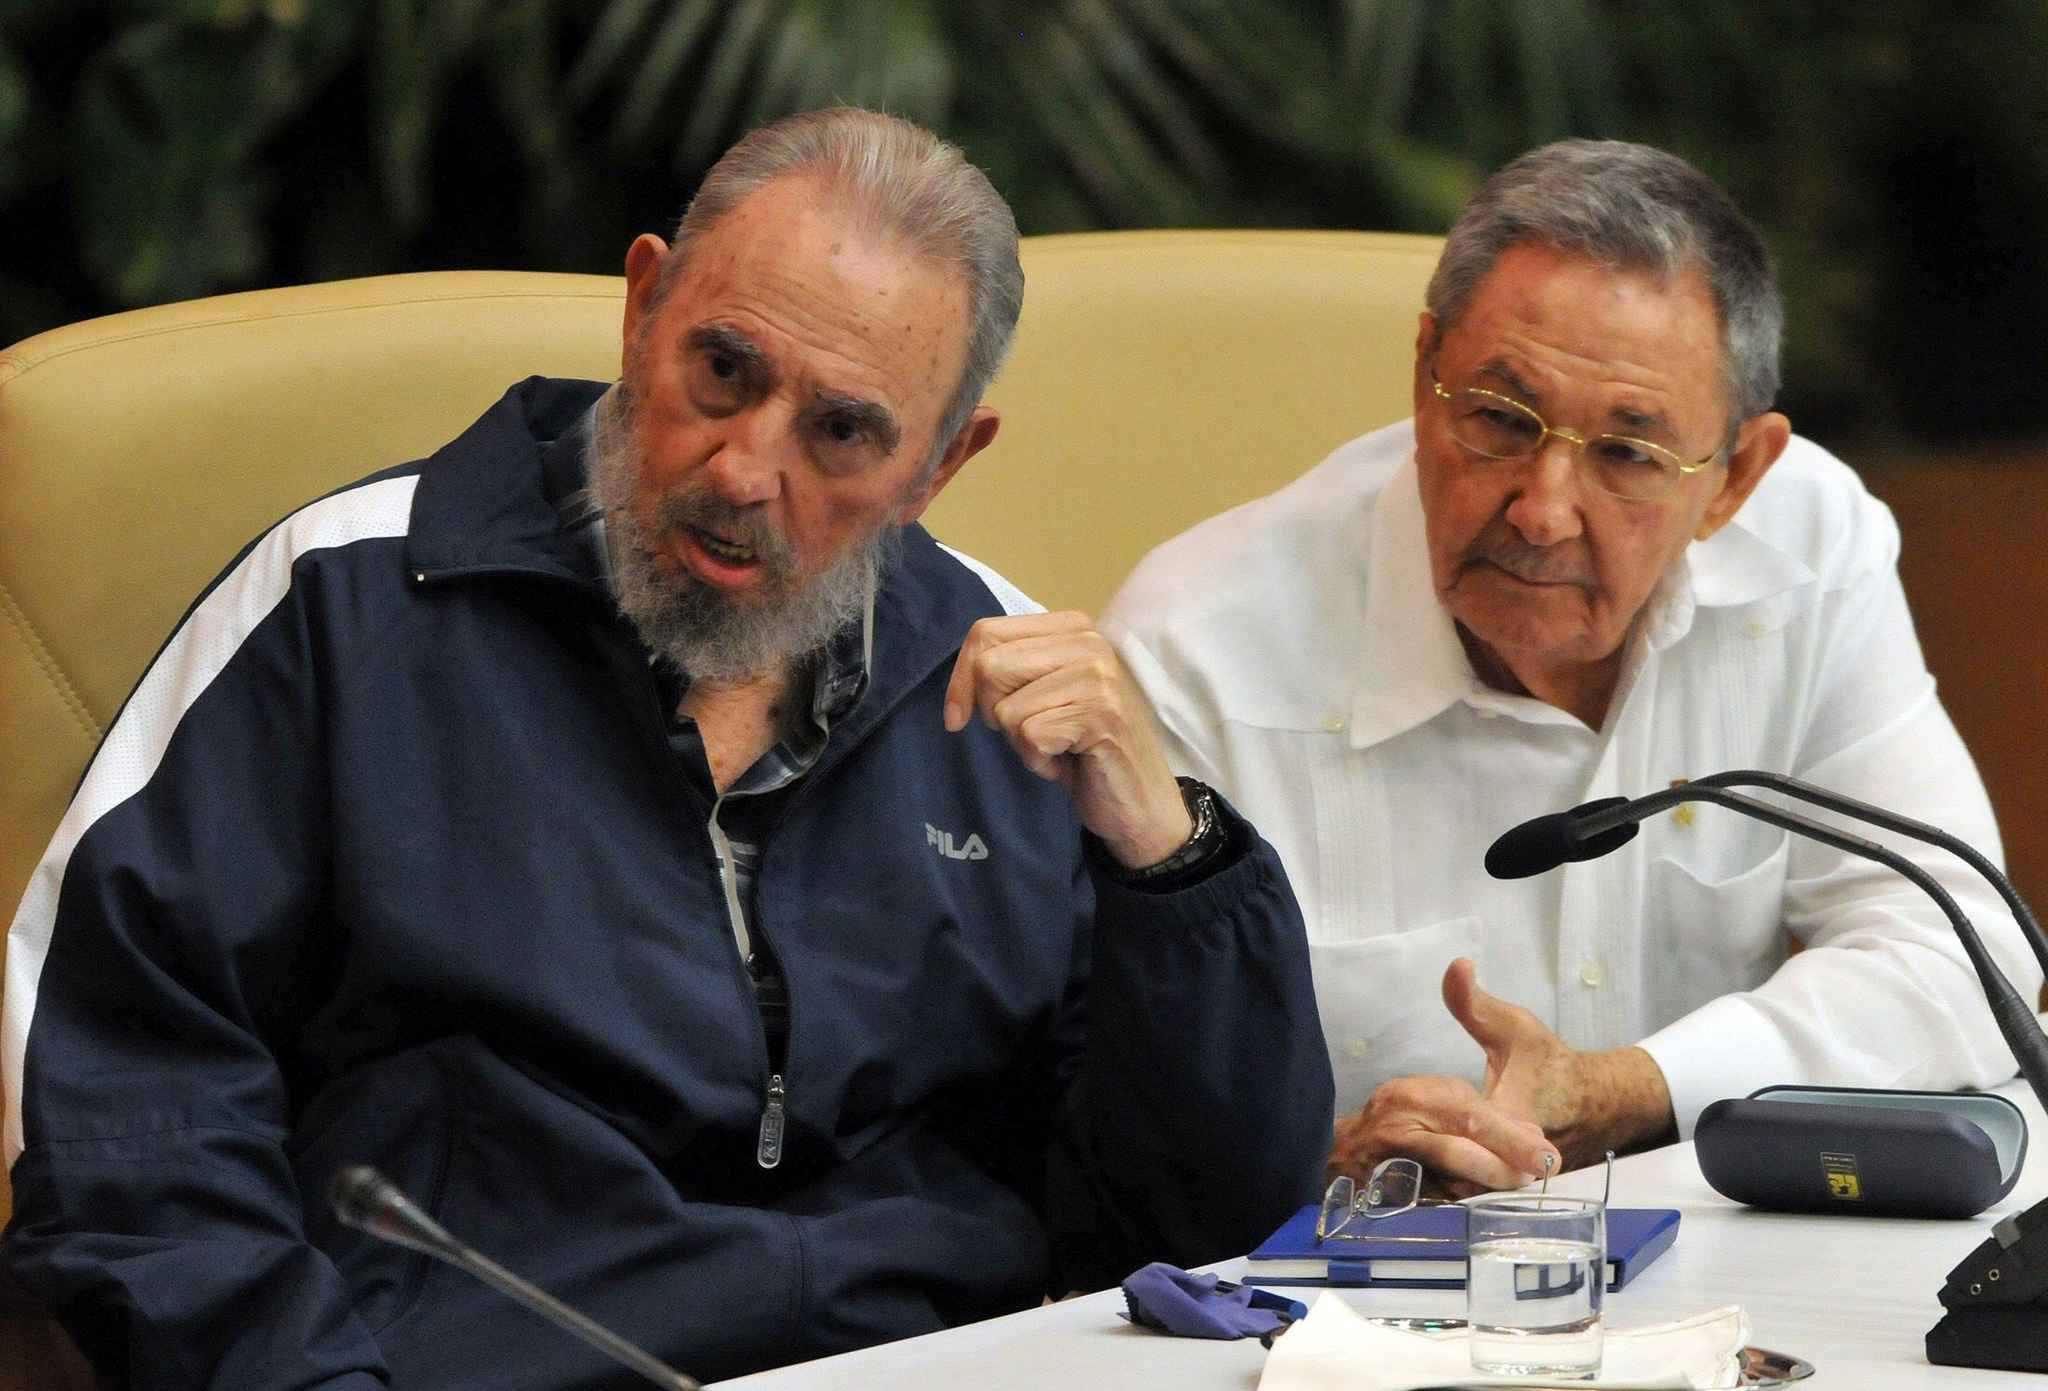 Xi Jinping: Fidel Castro